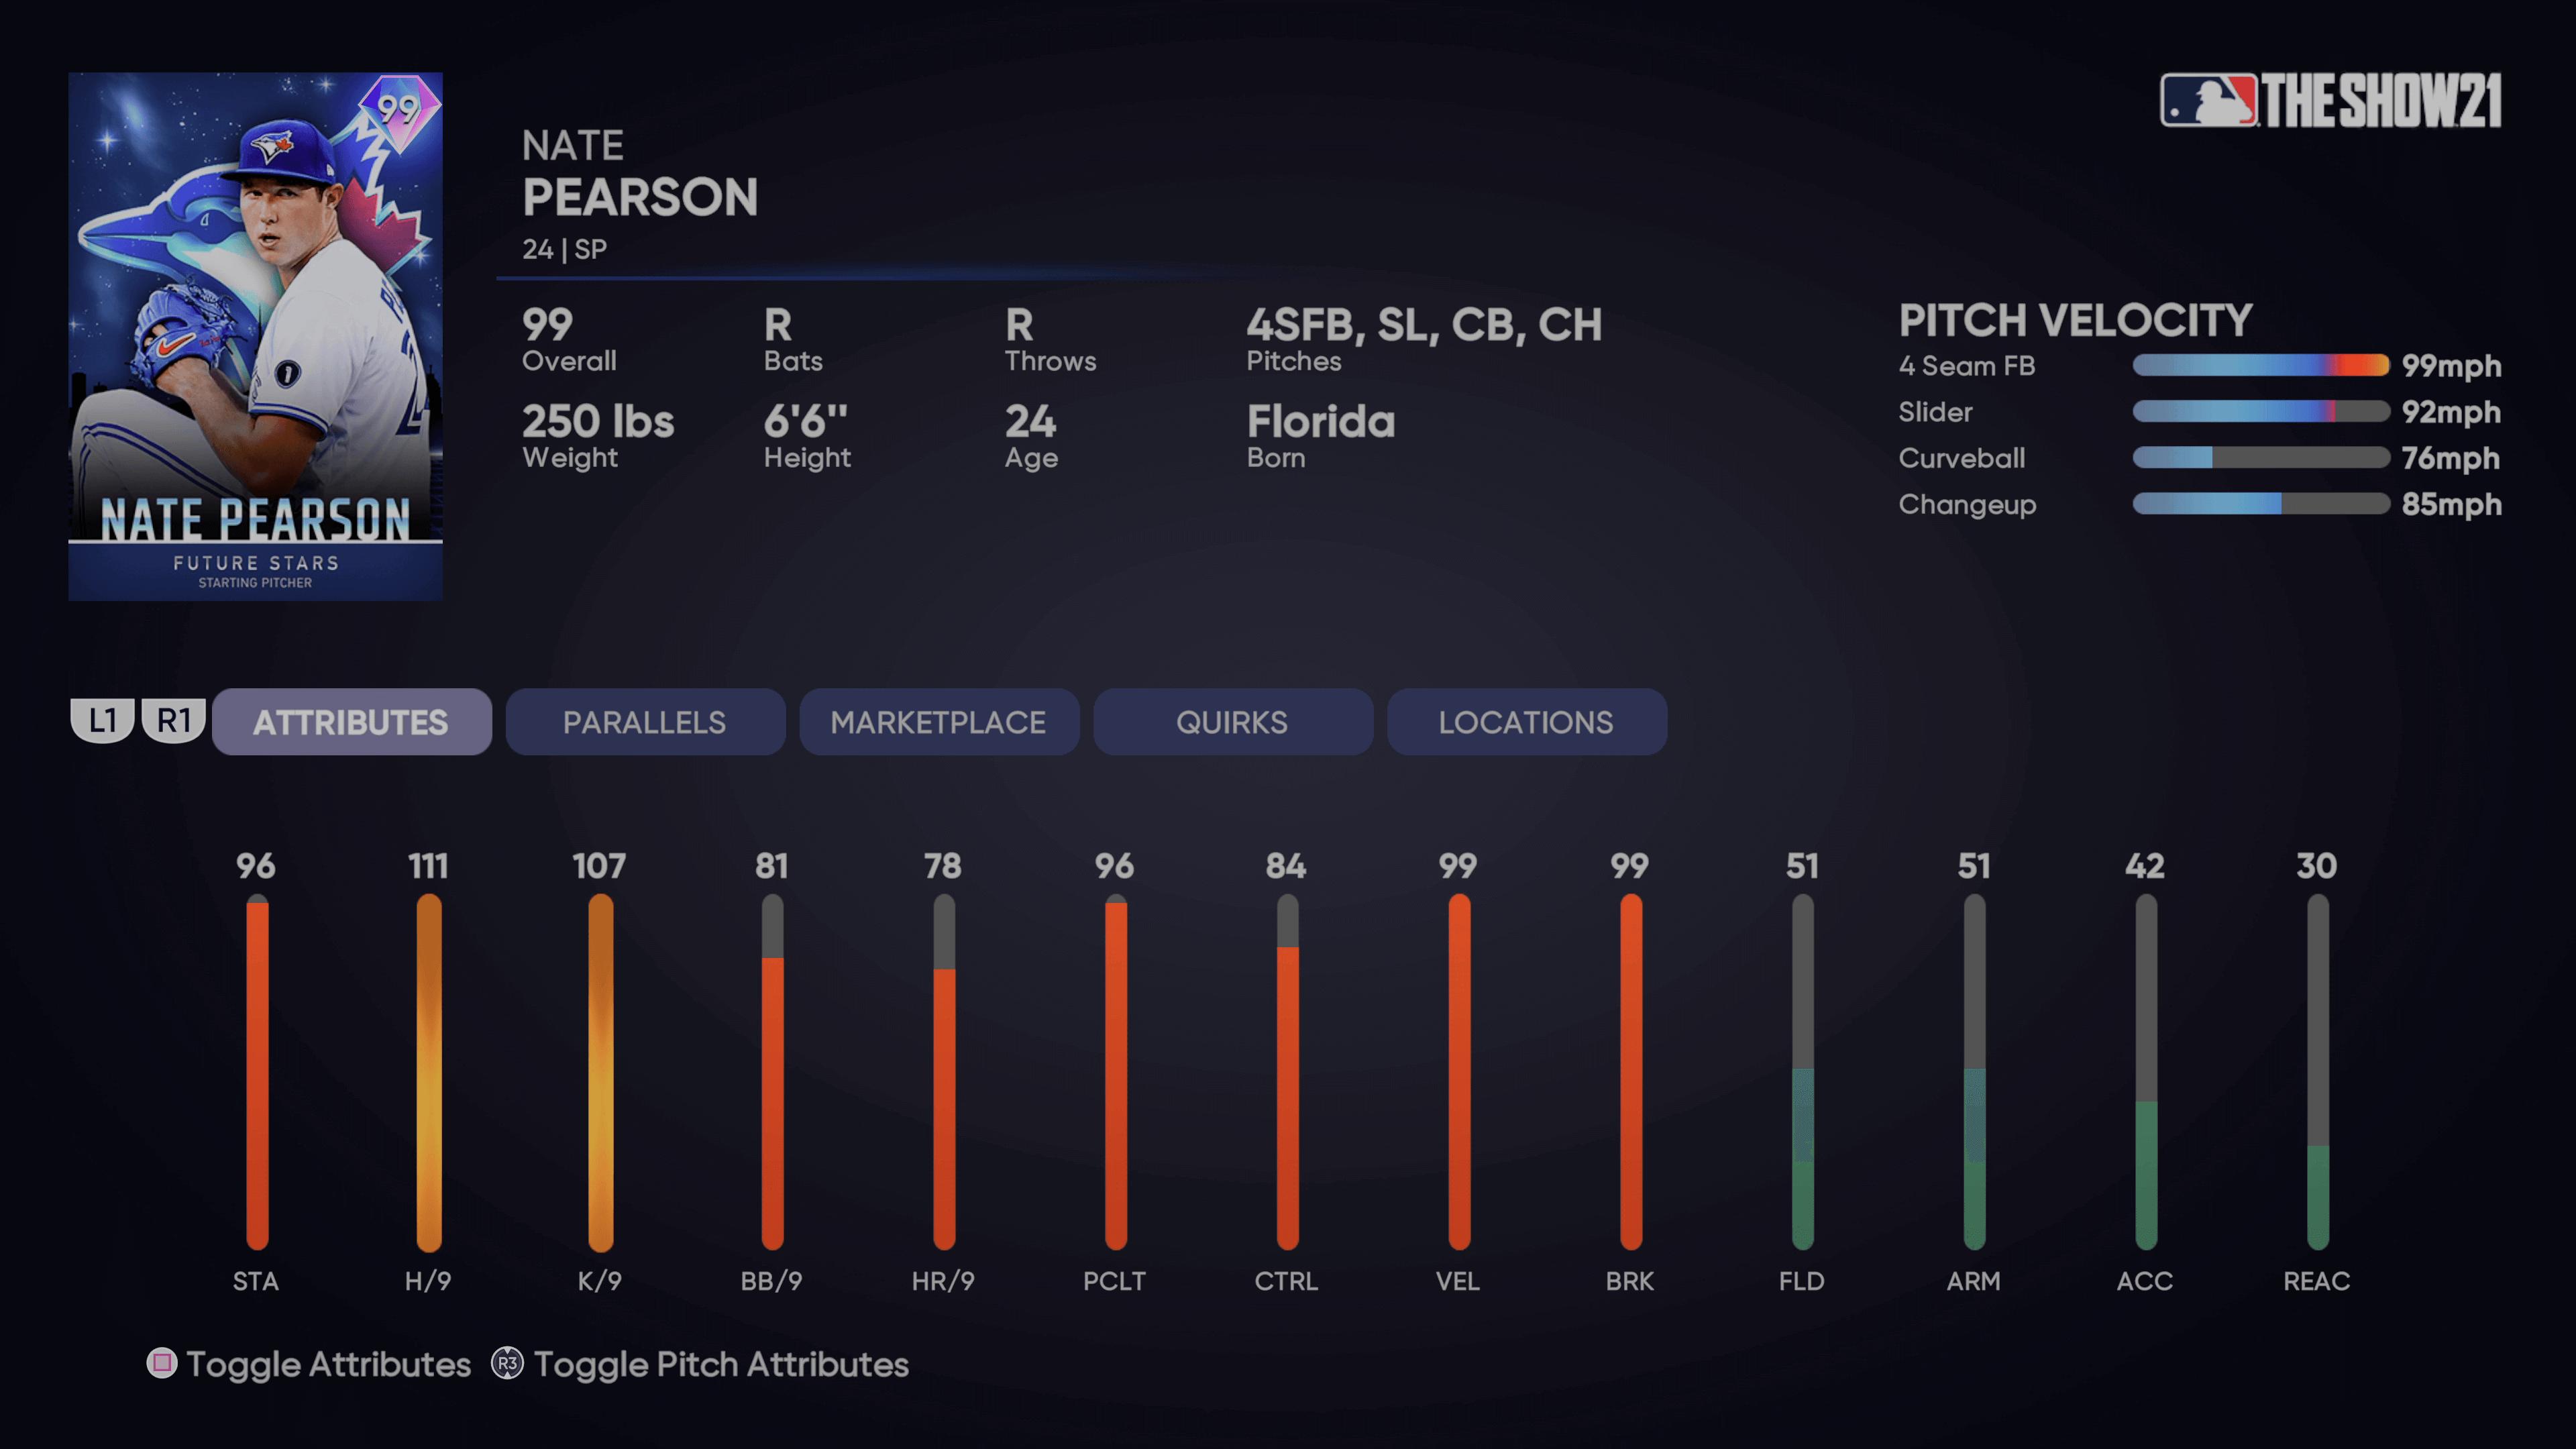 MLB The Show 21 - Headliners Set 37 Future Stars Nate Pearson_2021-09-10_15-12-18